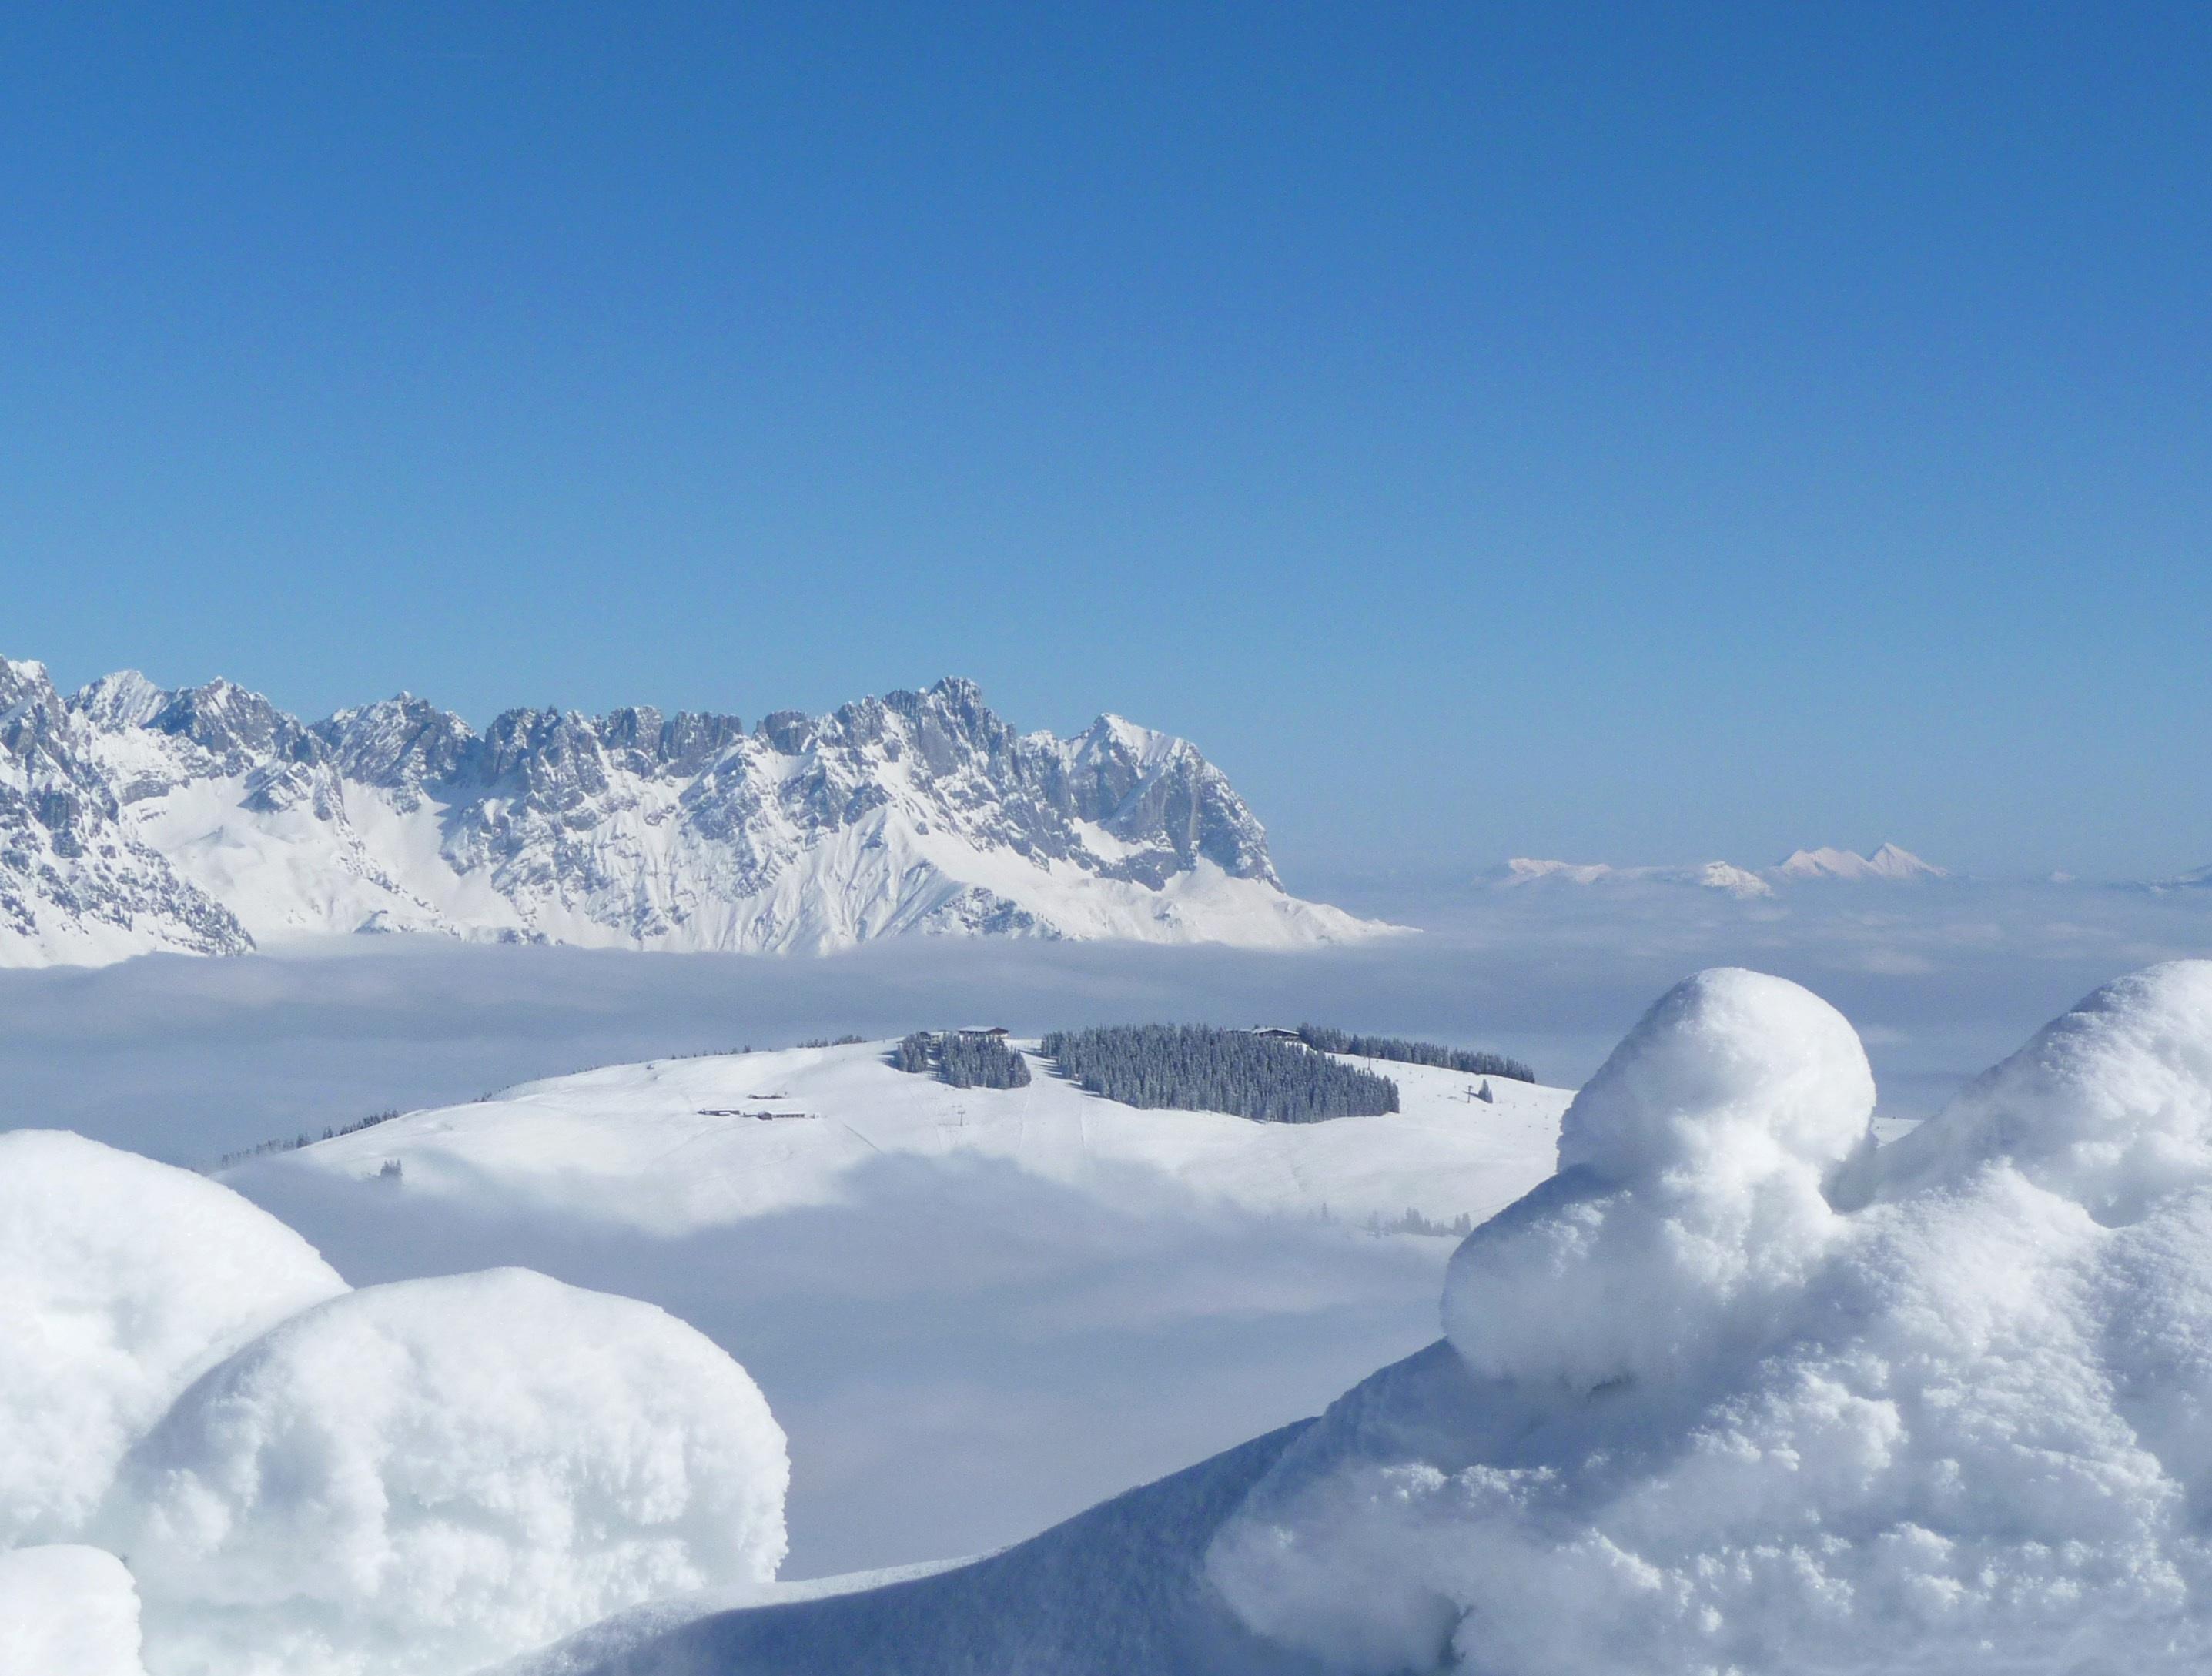 Snow Mountain Under Cloudy Sky Free Stock Photo